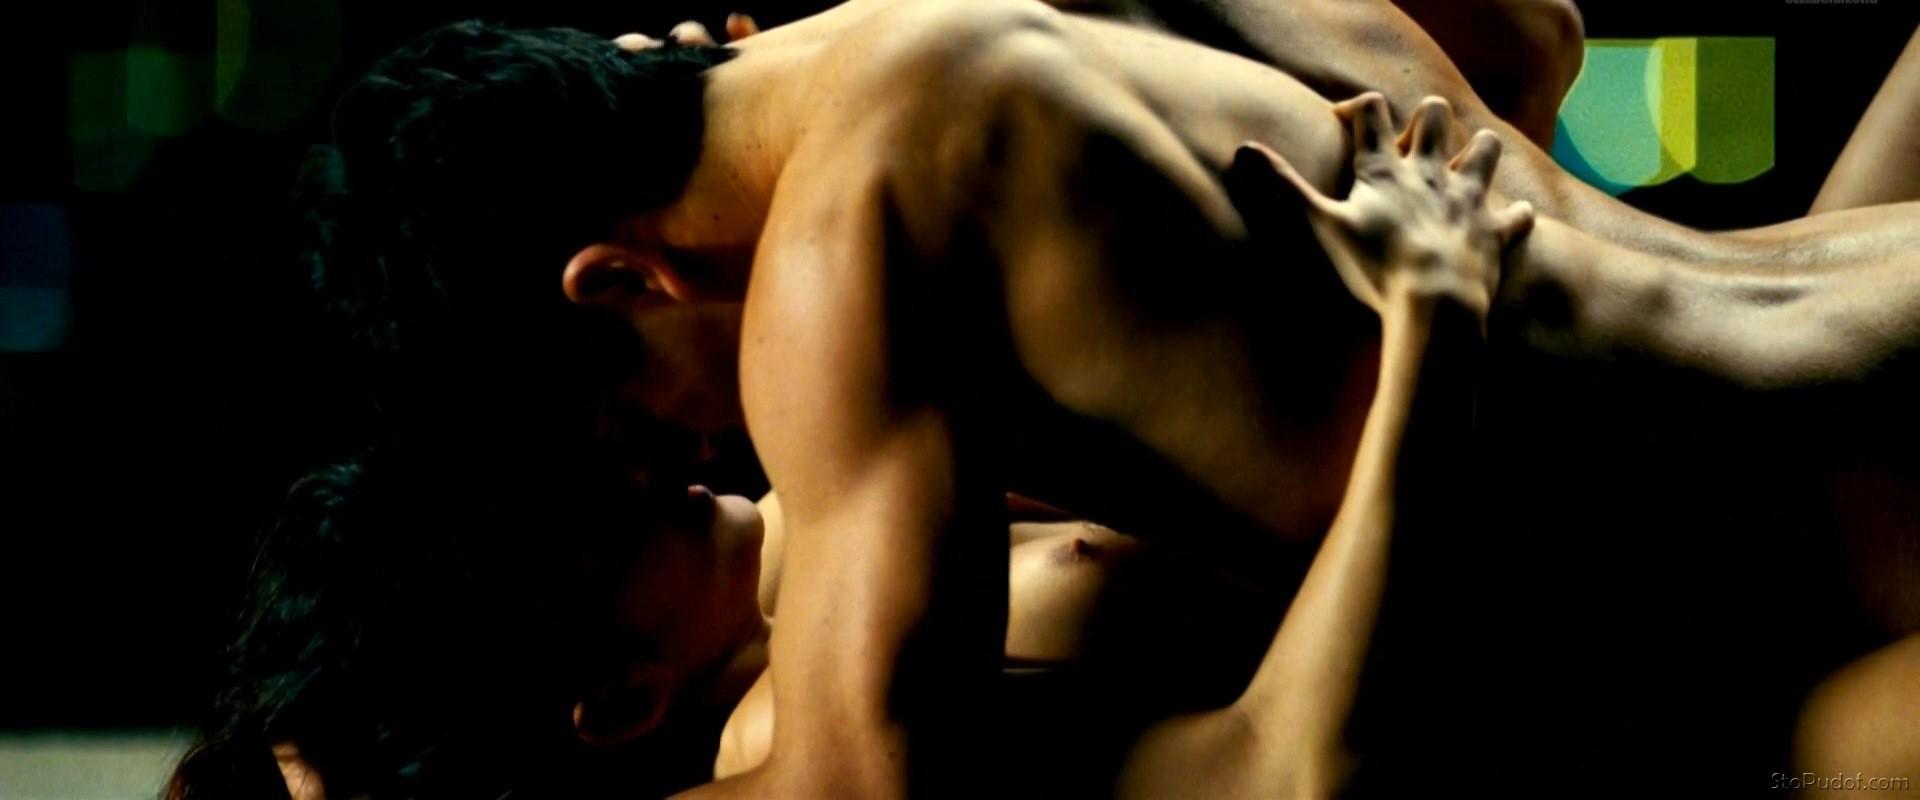 Lady gaga uncensored - 2 part 6